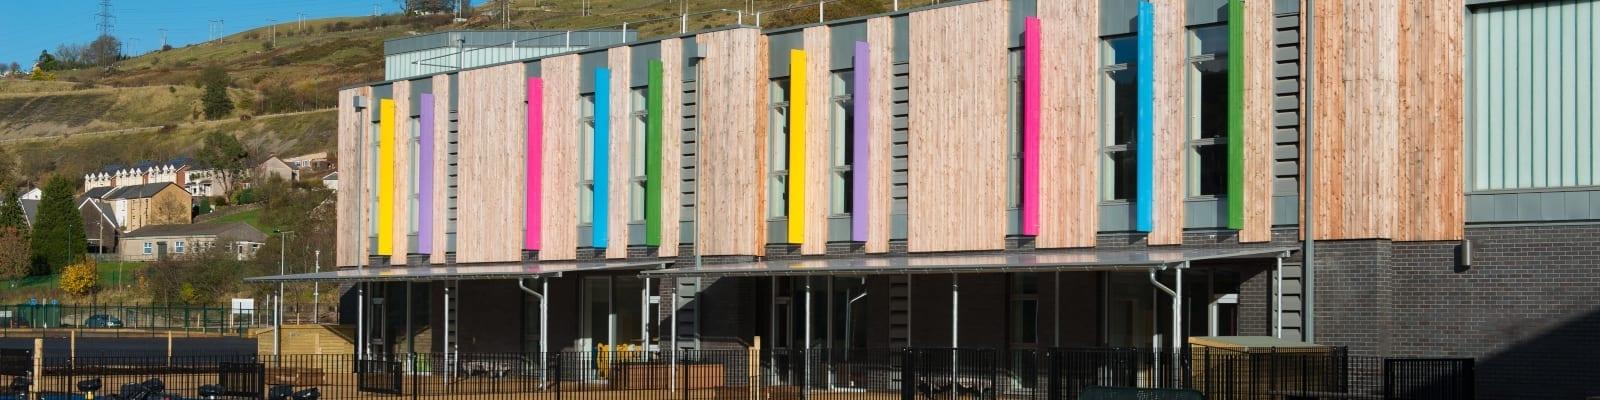 Ebbw Fawr Learning Community Shelter